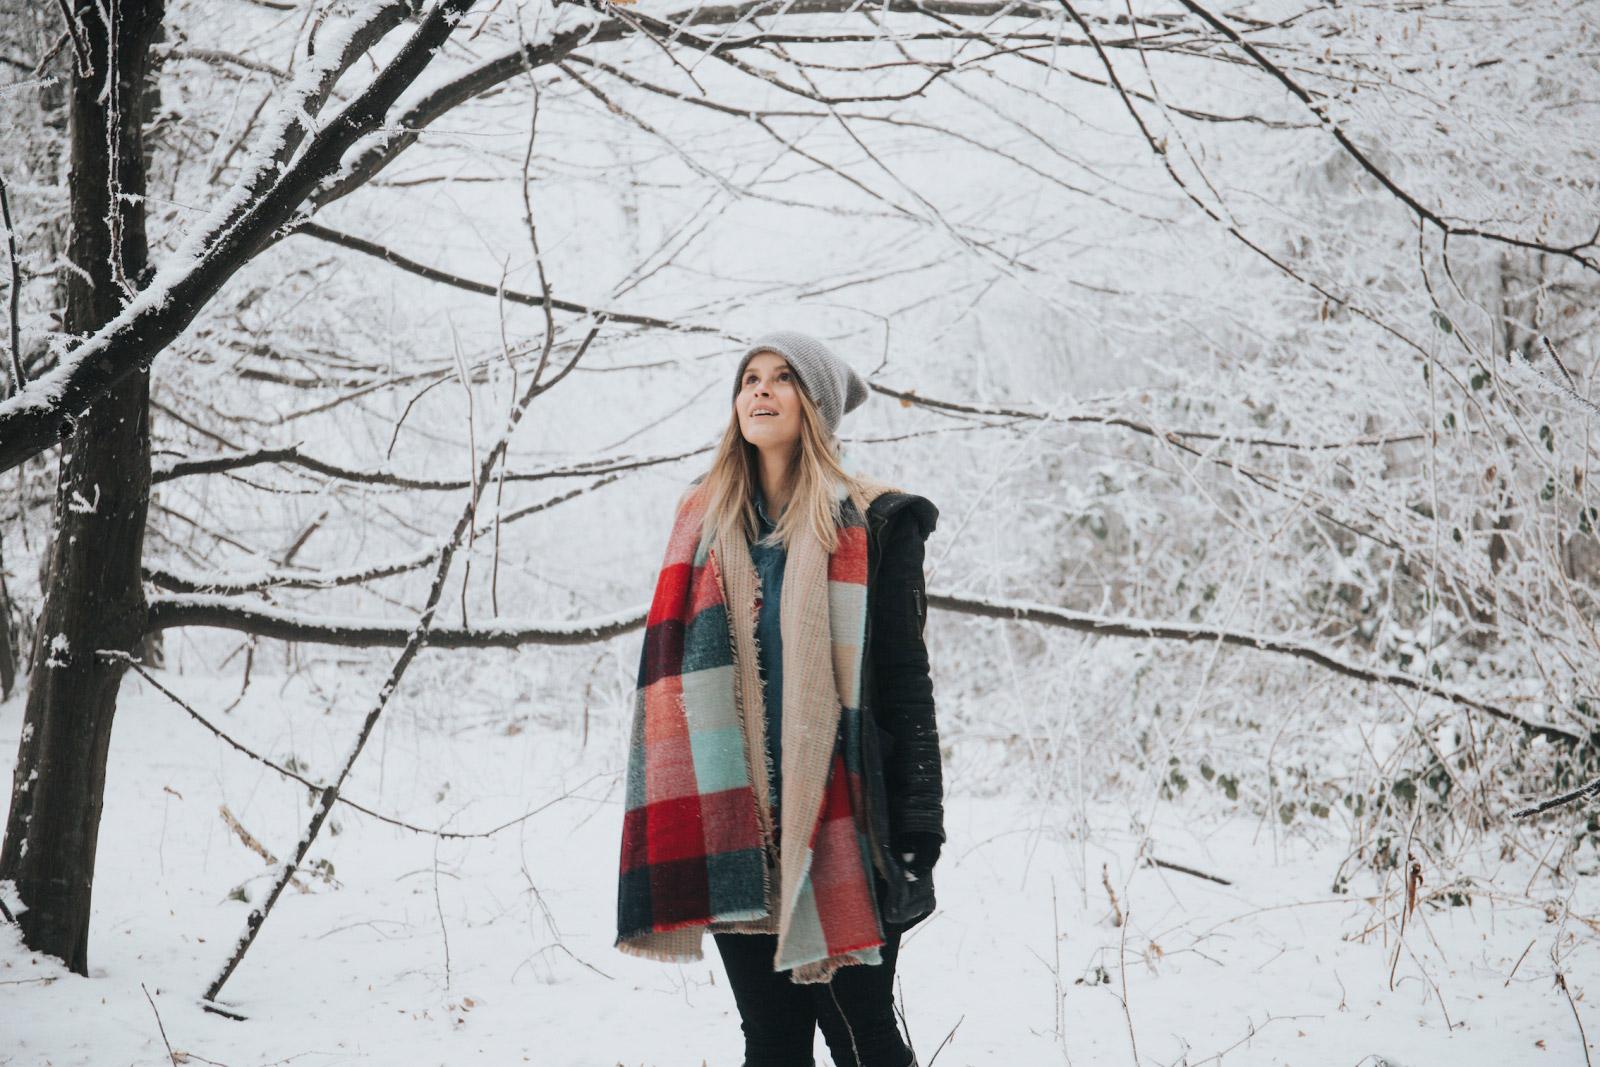 Matis-Reponse-Jeunesse-Climatis-abloomnova.net_-1600x1067 The importance of a good winter moisturiser